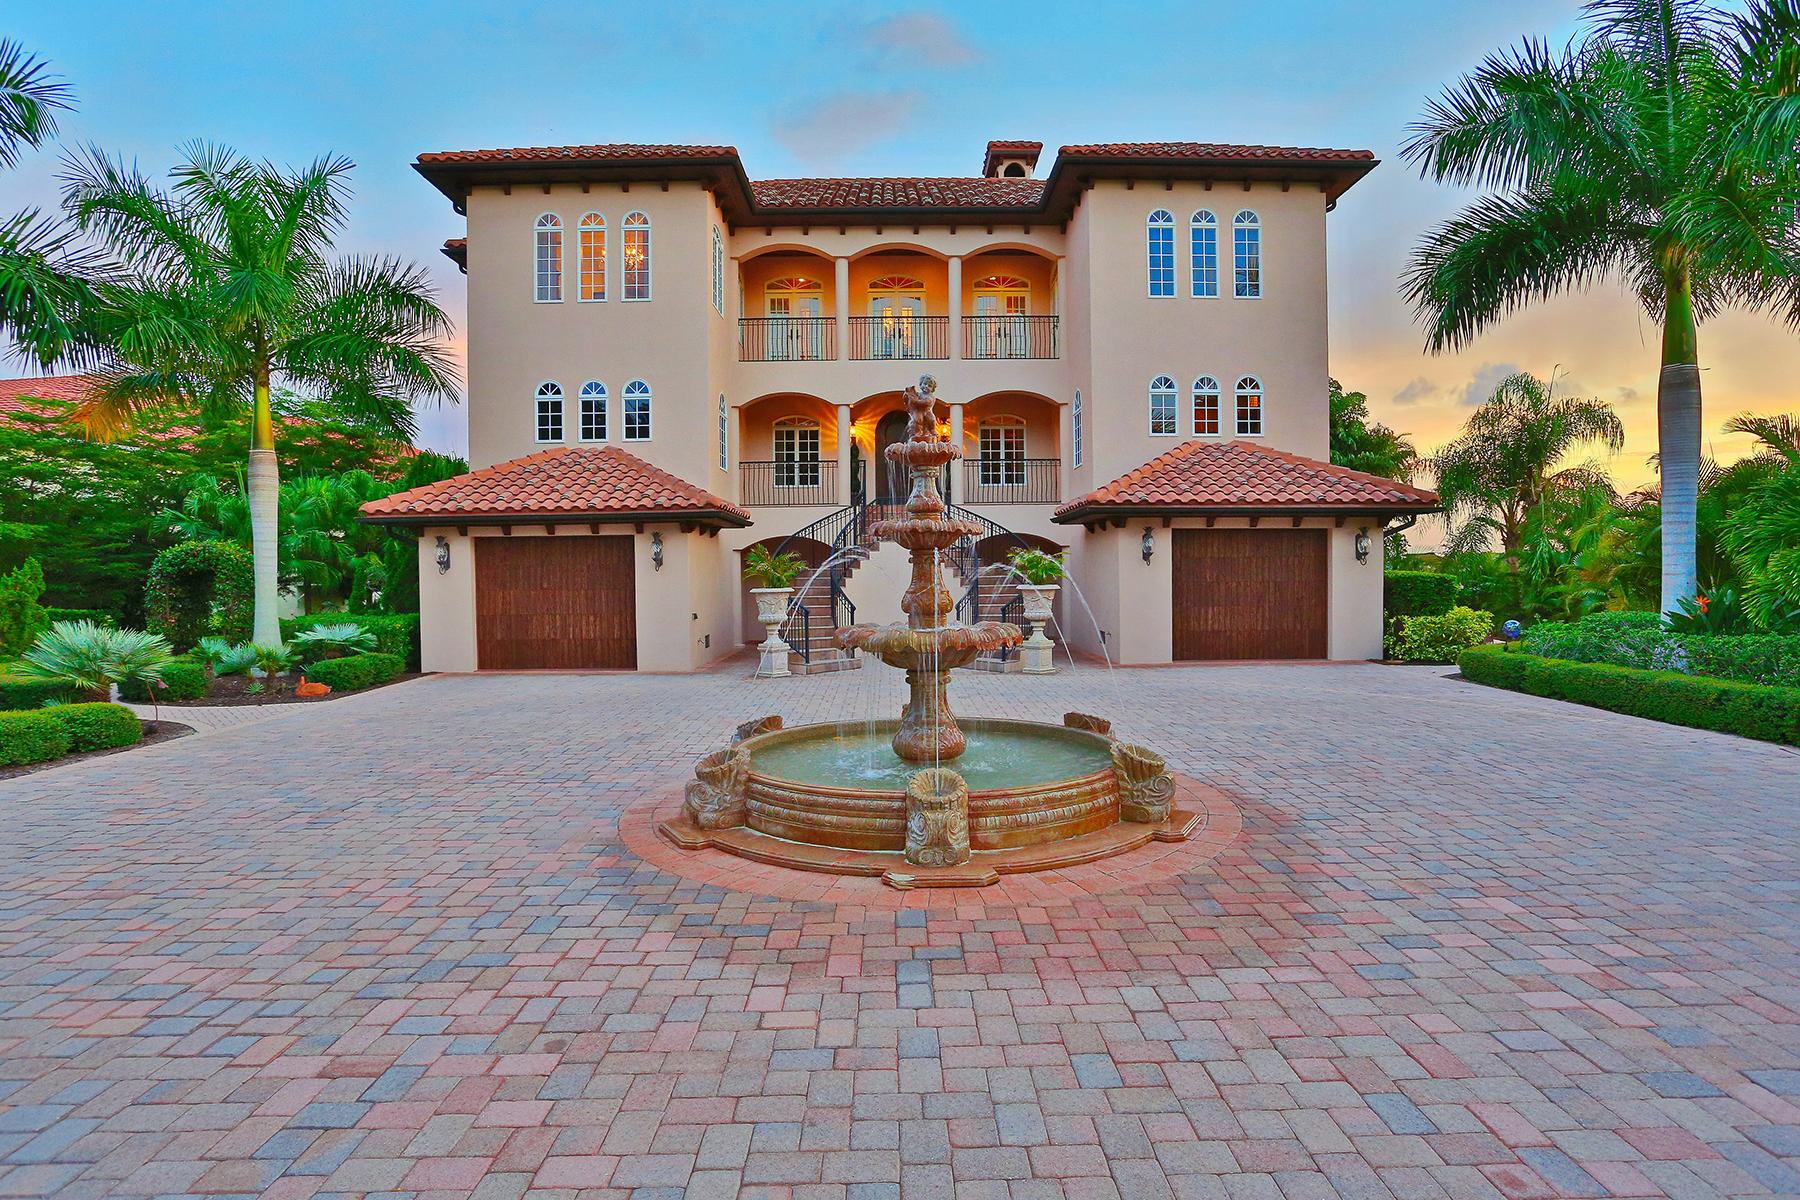 Single Family Home for Sale at CAPE HAZE - PLACIDA 235 Green Dolphin Dr Placida, Florida 33946 United States